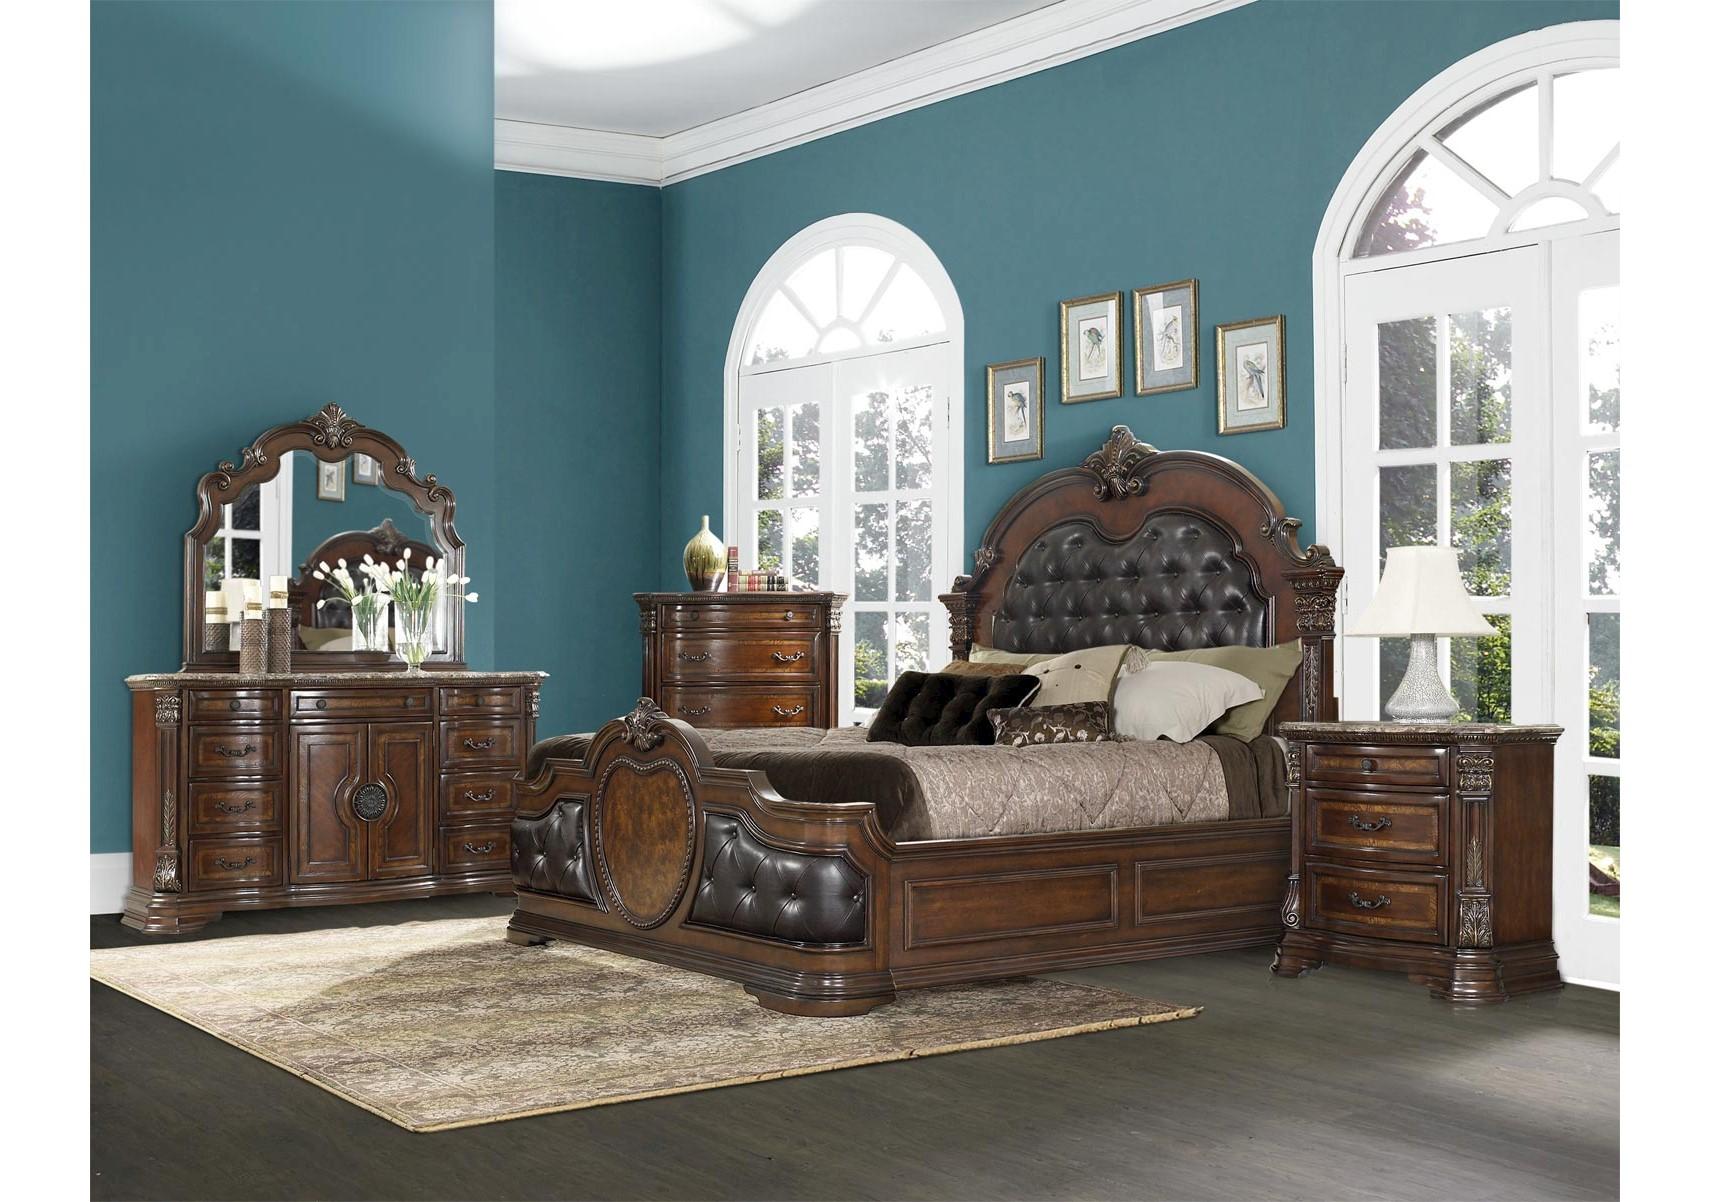 Lacks | Cartagena 4-Pc Queen Bedroom Set